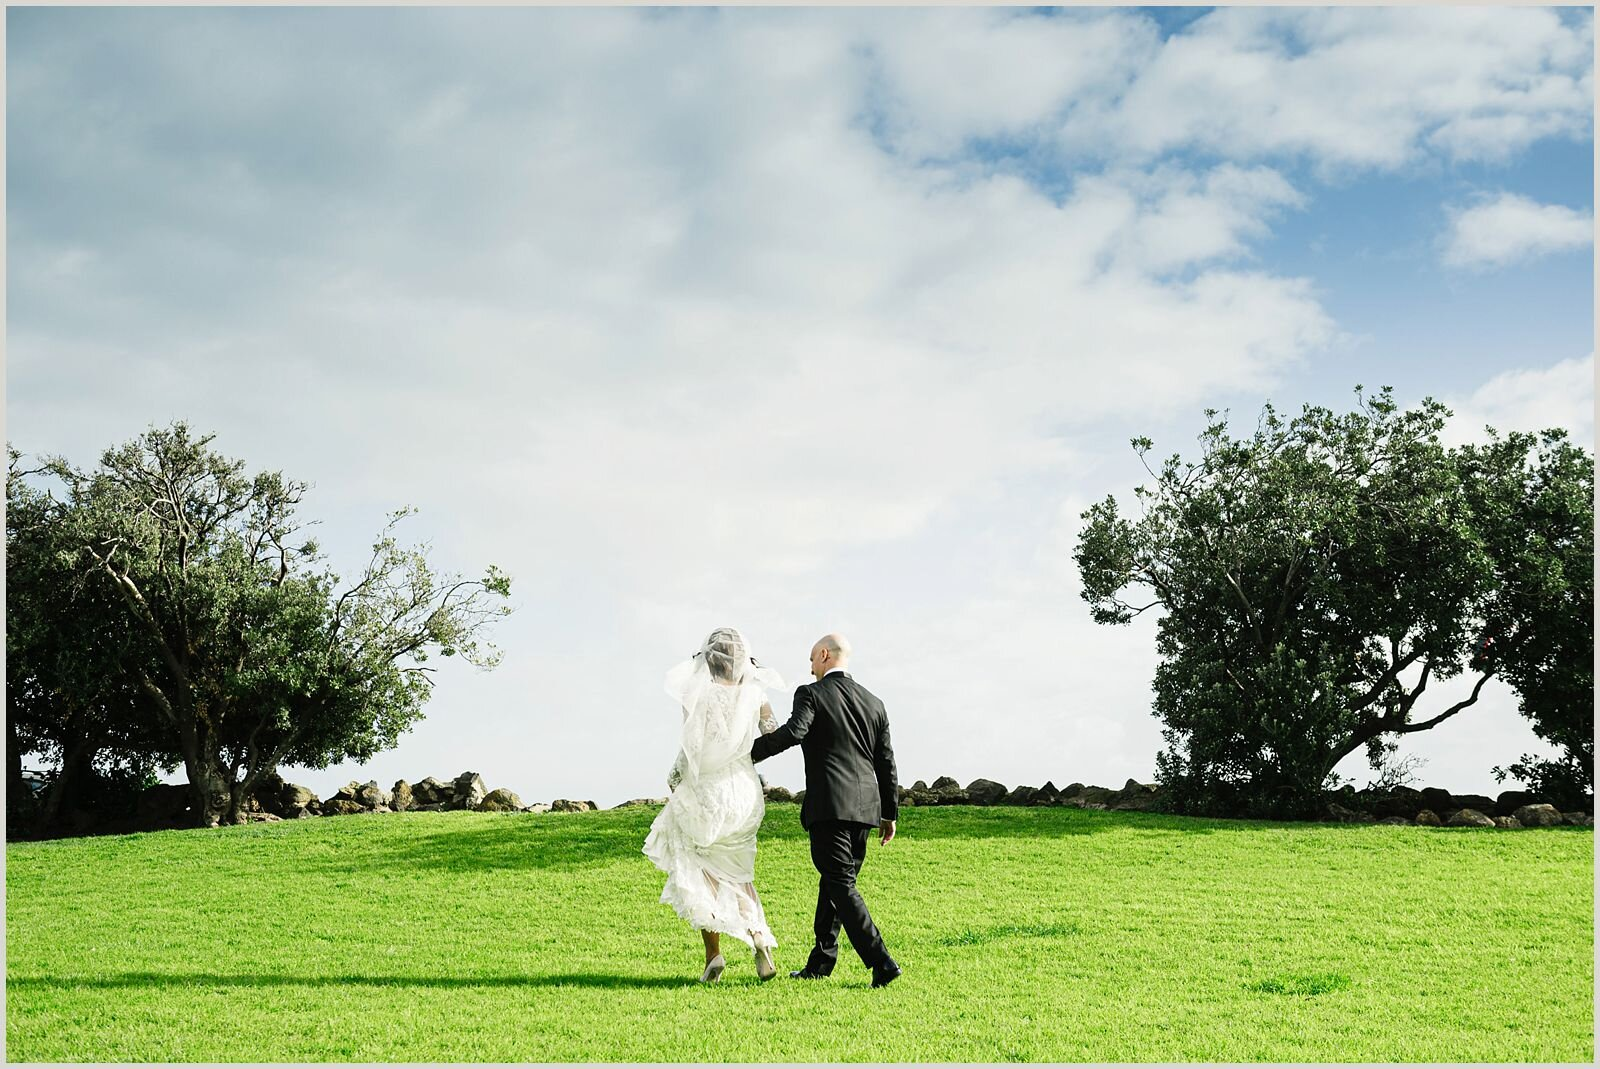 joseph_koprek_wedding_melbourne_the_prince_deck_0030.jpg